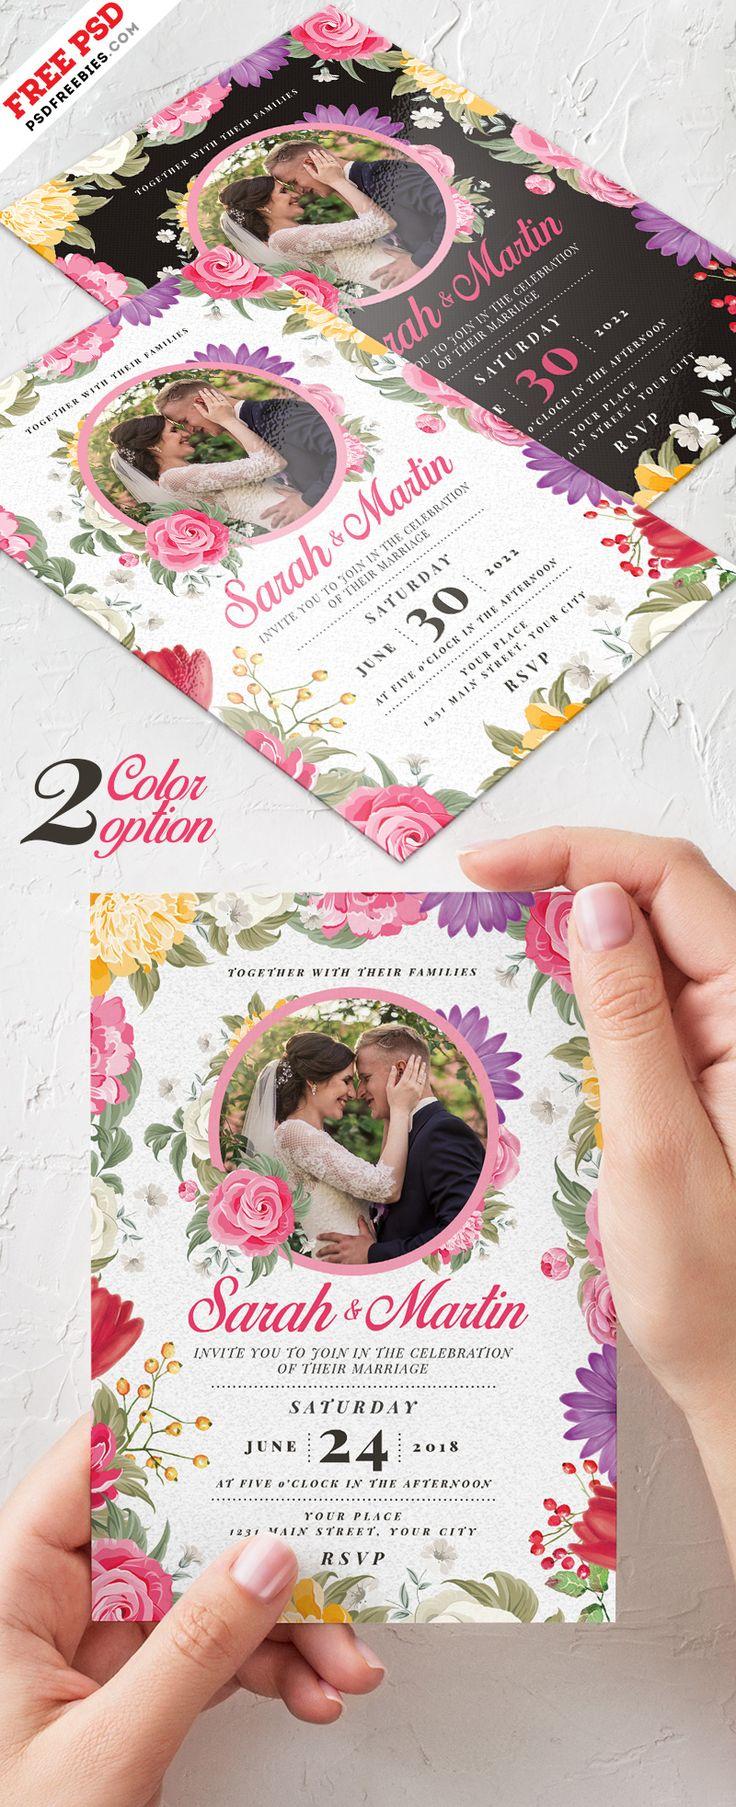 wedding invitation design psd%0A Wedding Invitation Card Design PSD